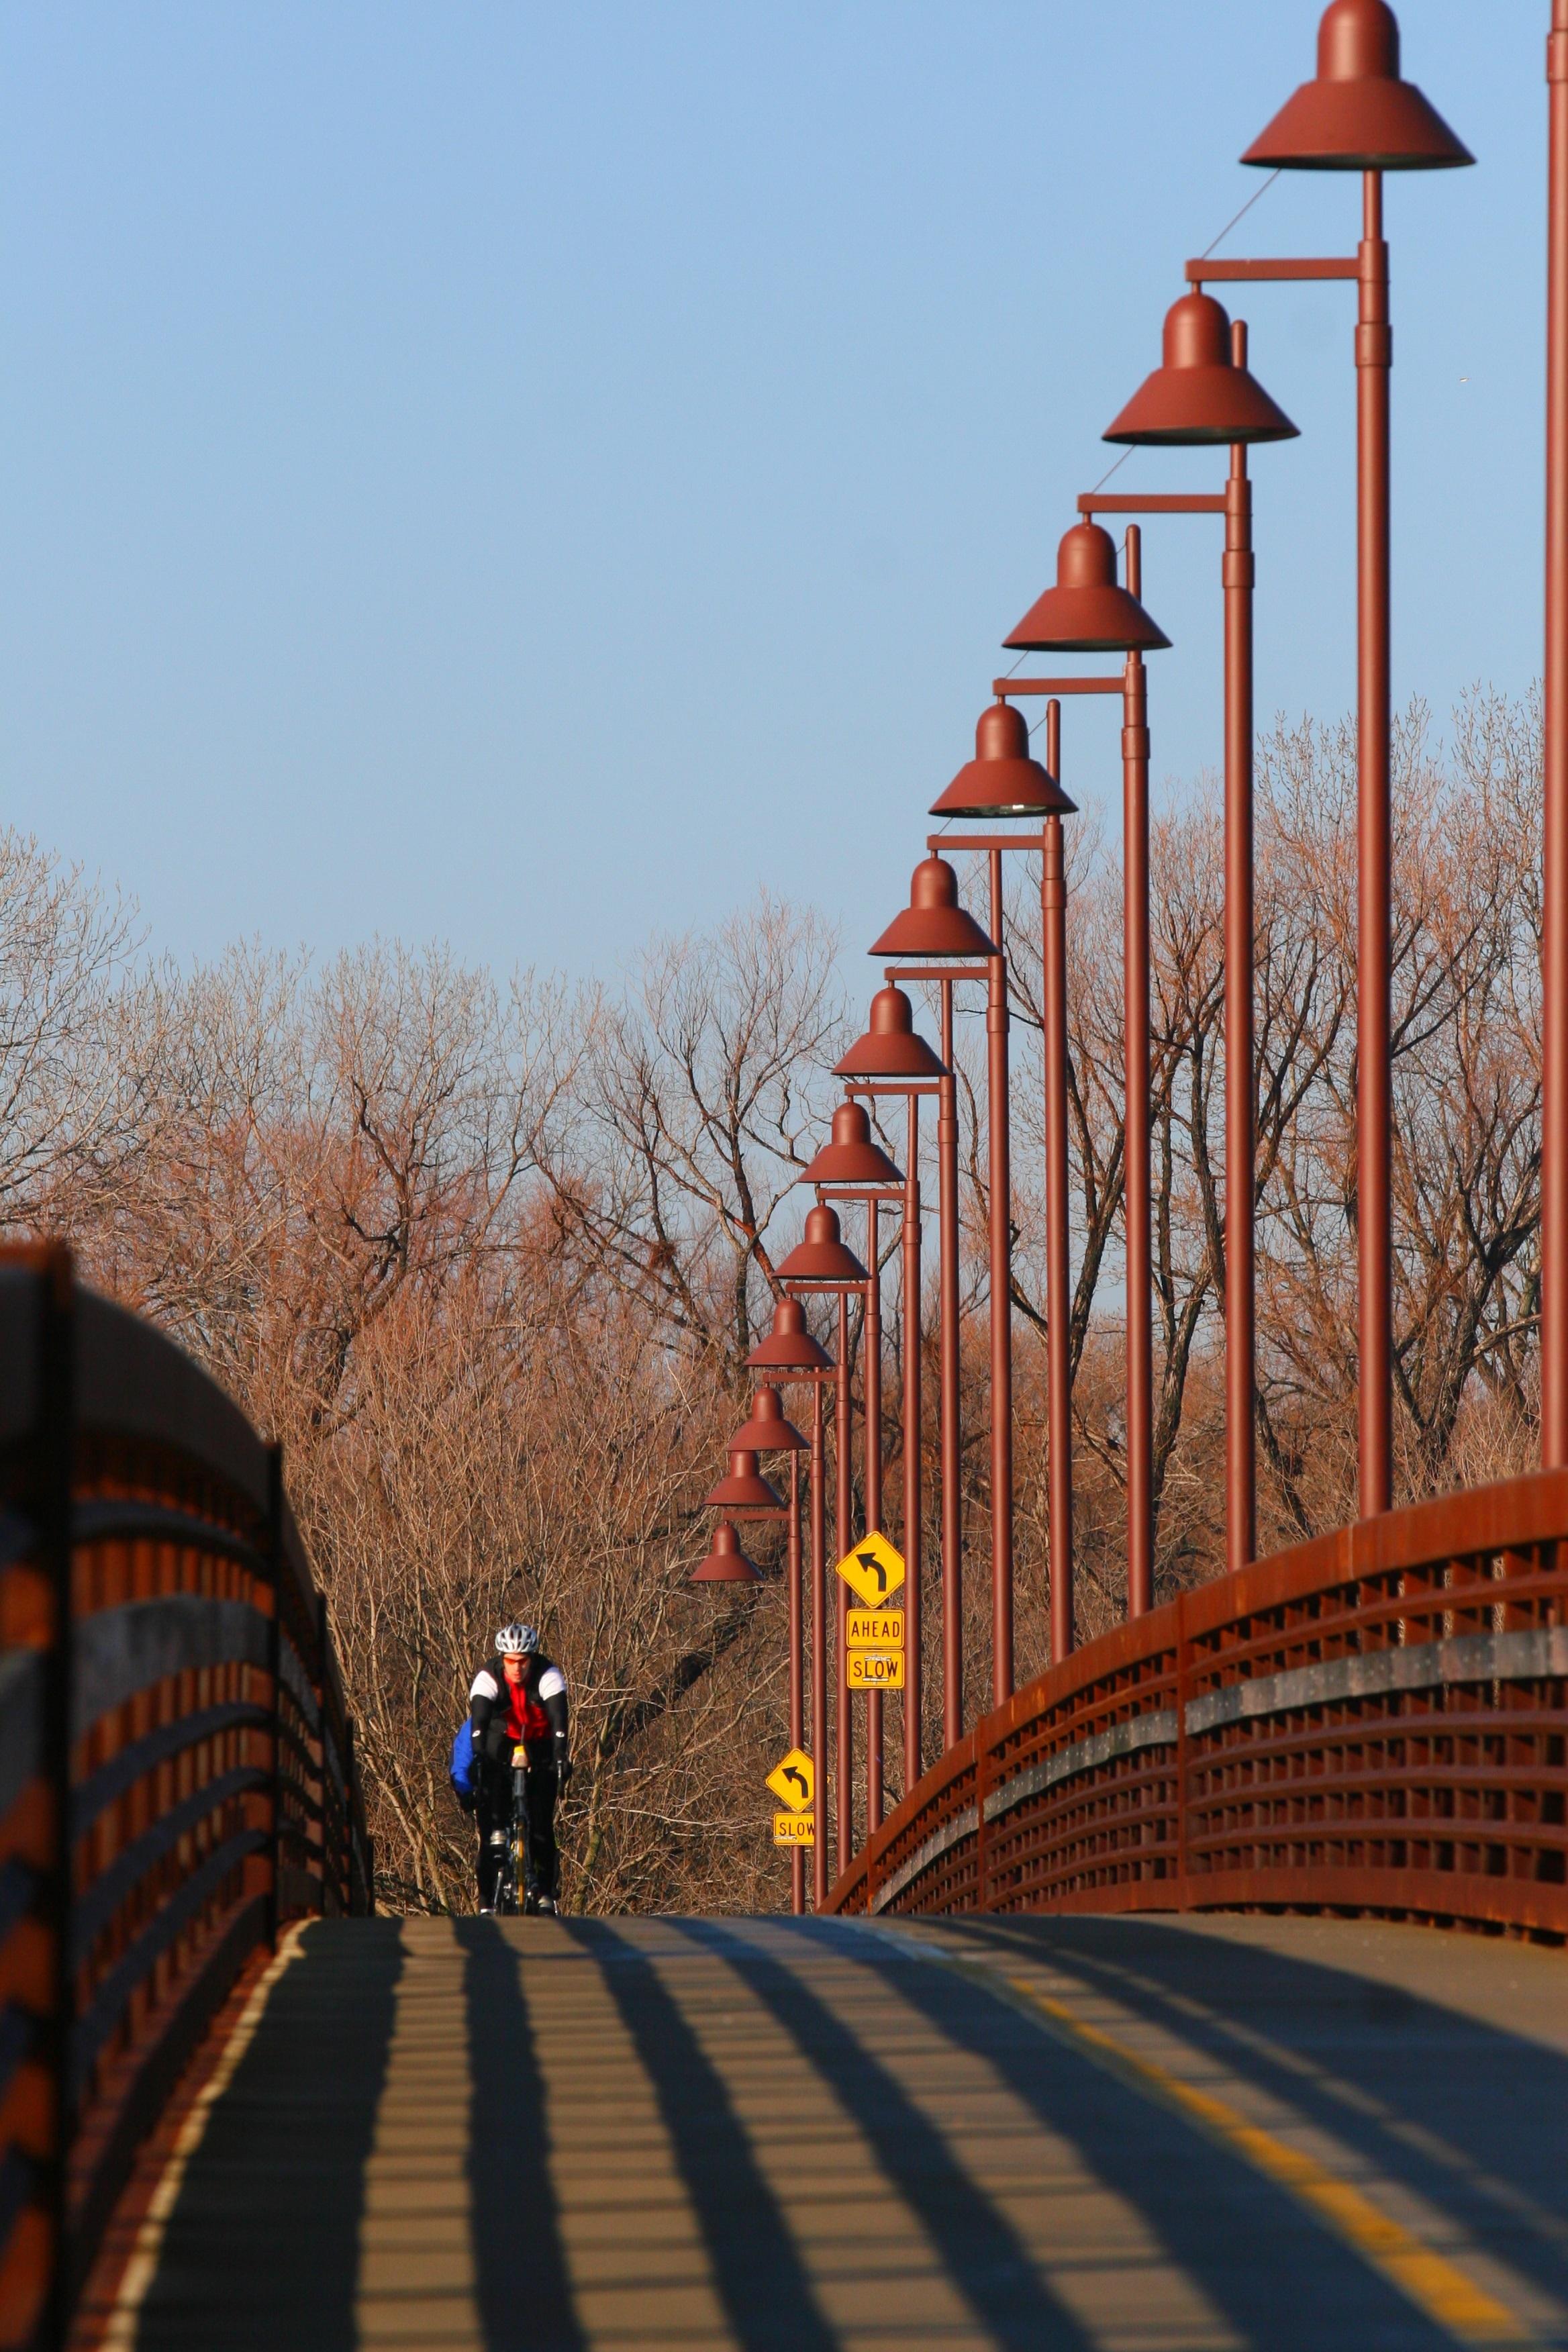 Bicycle Rider, Activity, Bicycle, Bike, Human, HQ Photo